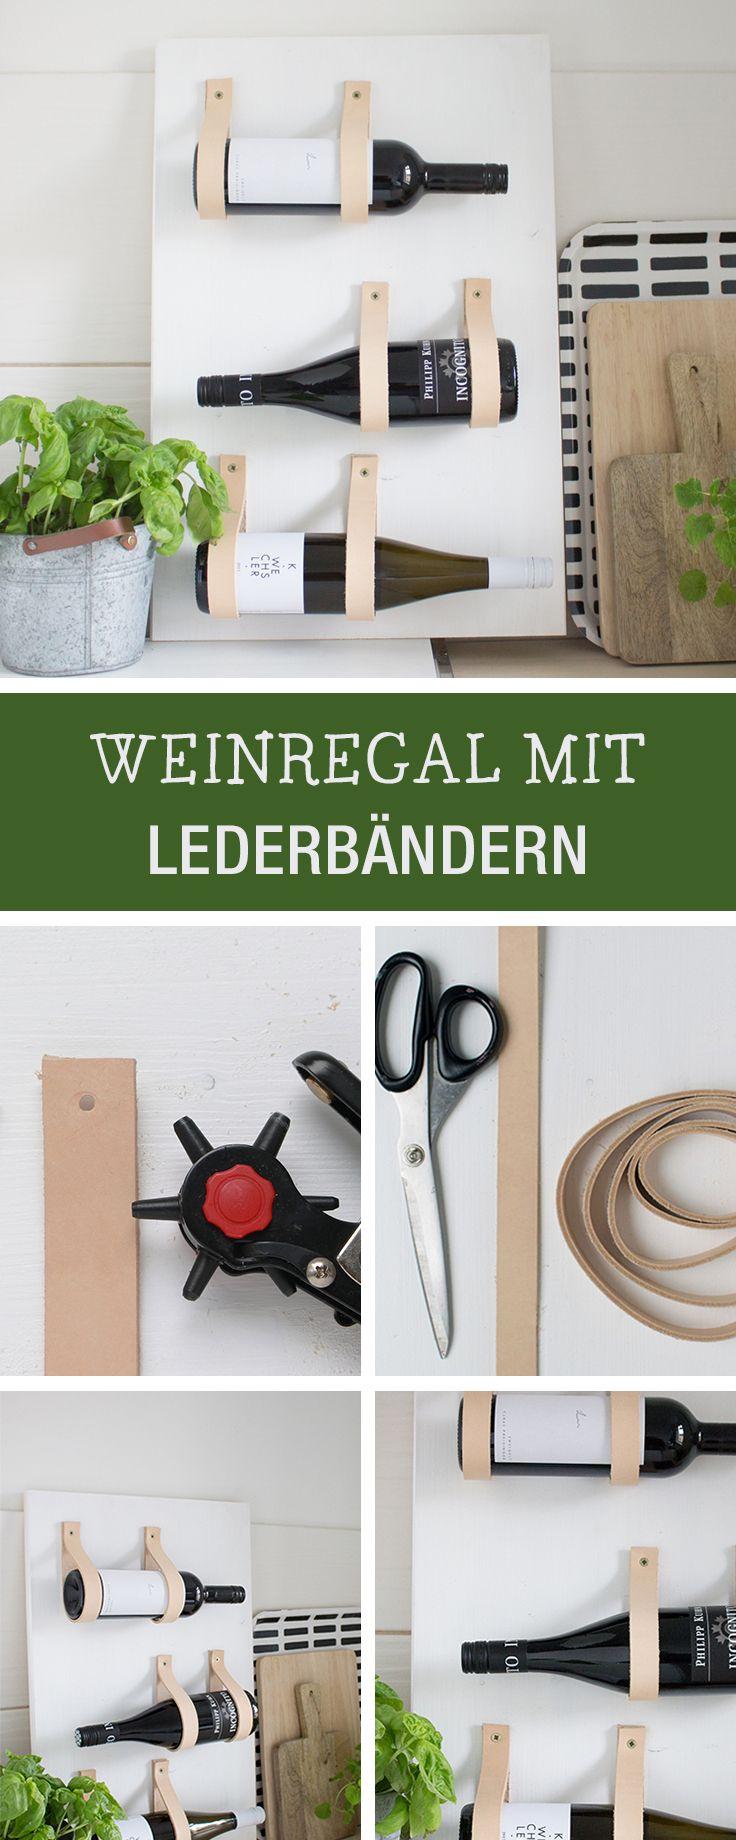 DIY Möbel: Weinregal bauen aus Holz mit Ledergriffen / diy furniture: how to build a wine rack via DaWanda.com